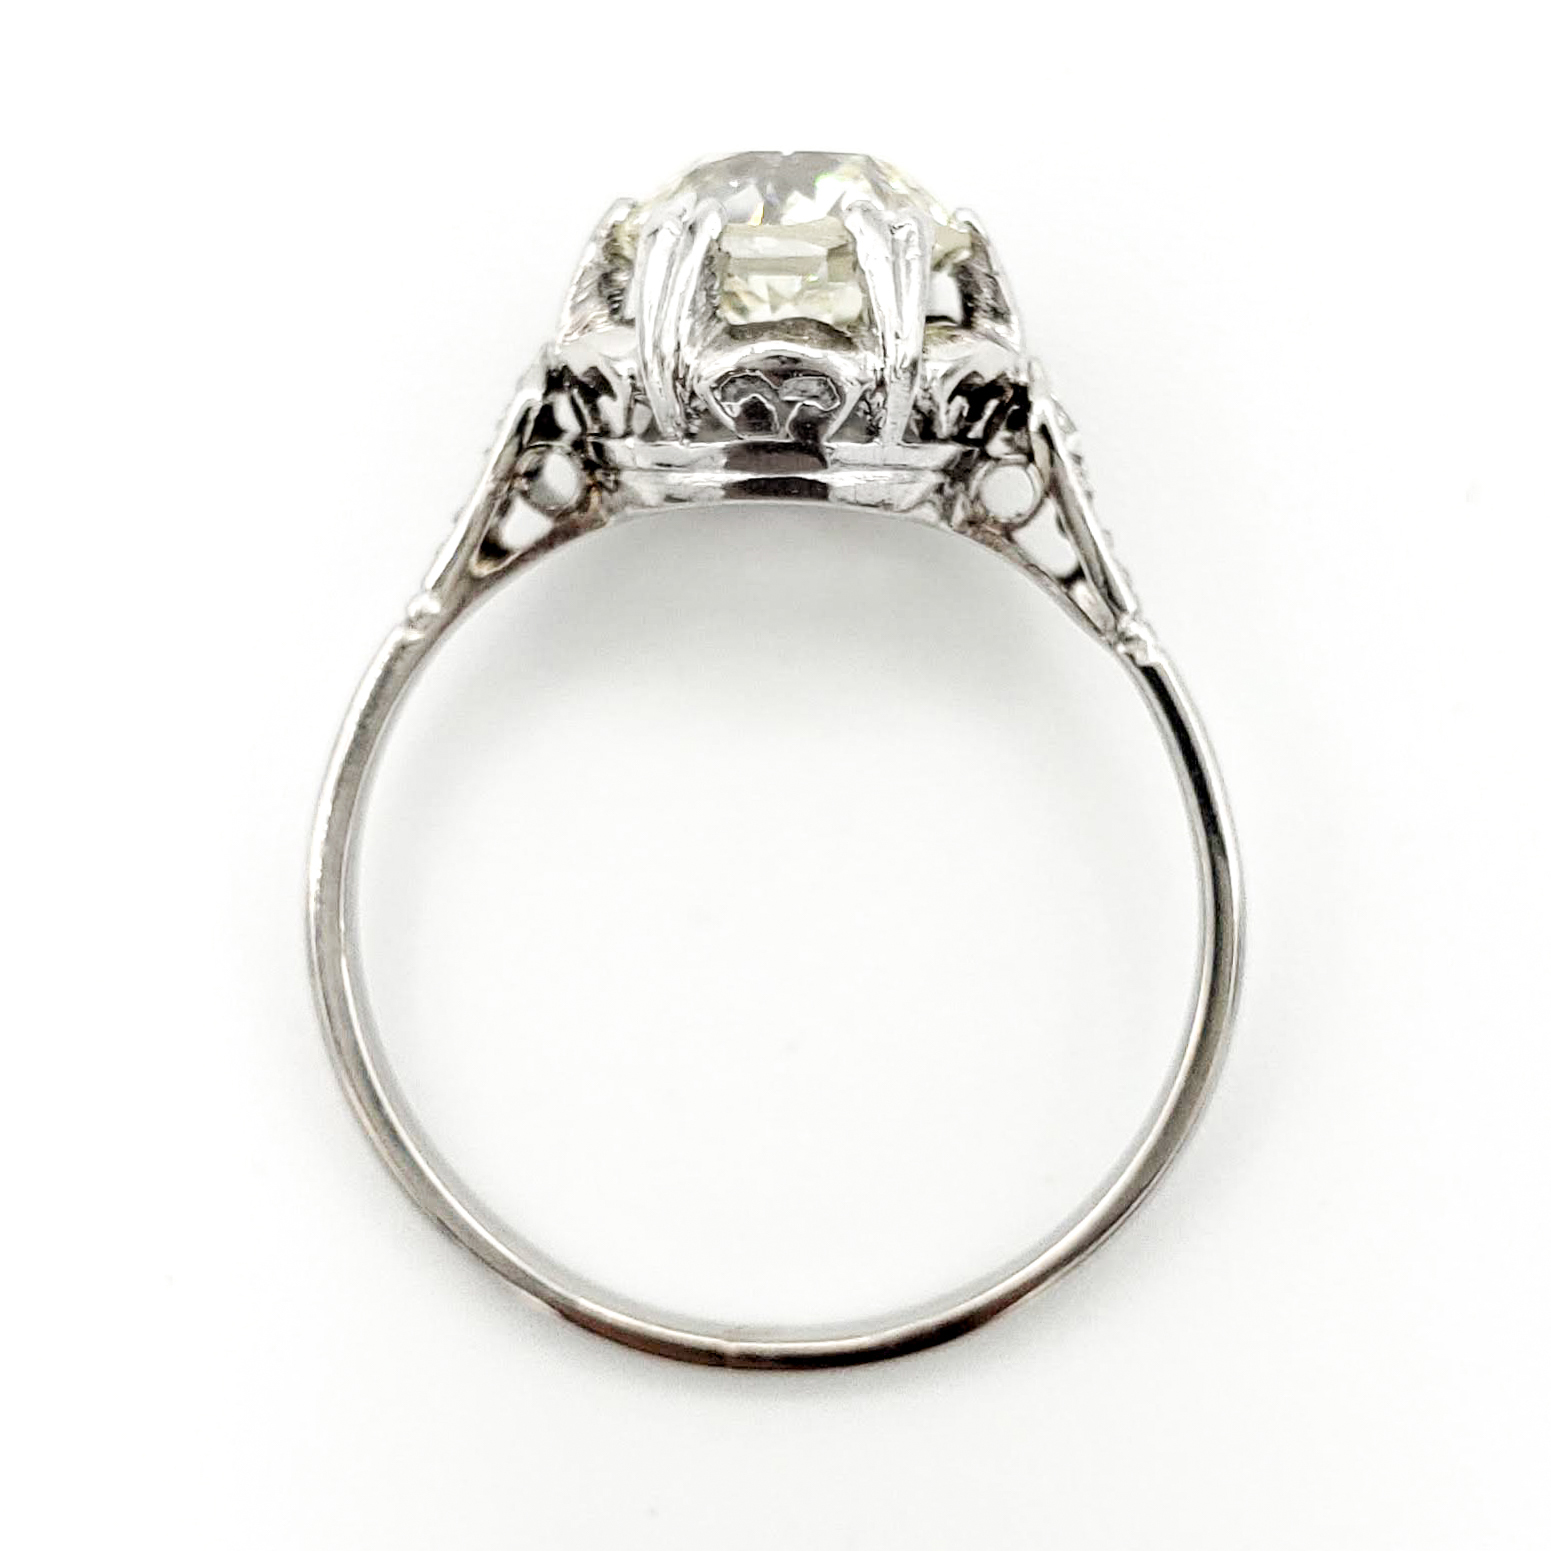 vintage-platinum-engagement-ring-with-1-63-carat-old-european-cut-diamond-egl-l-vs1